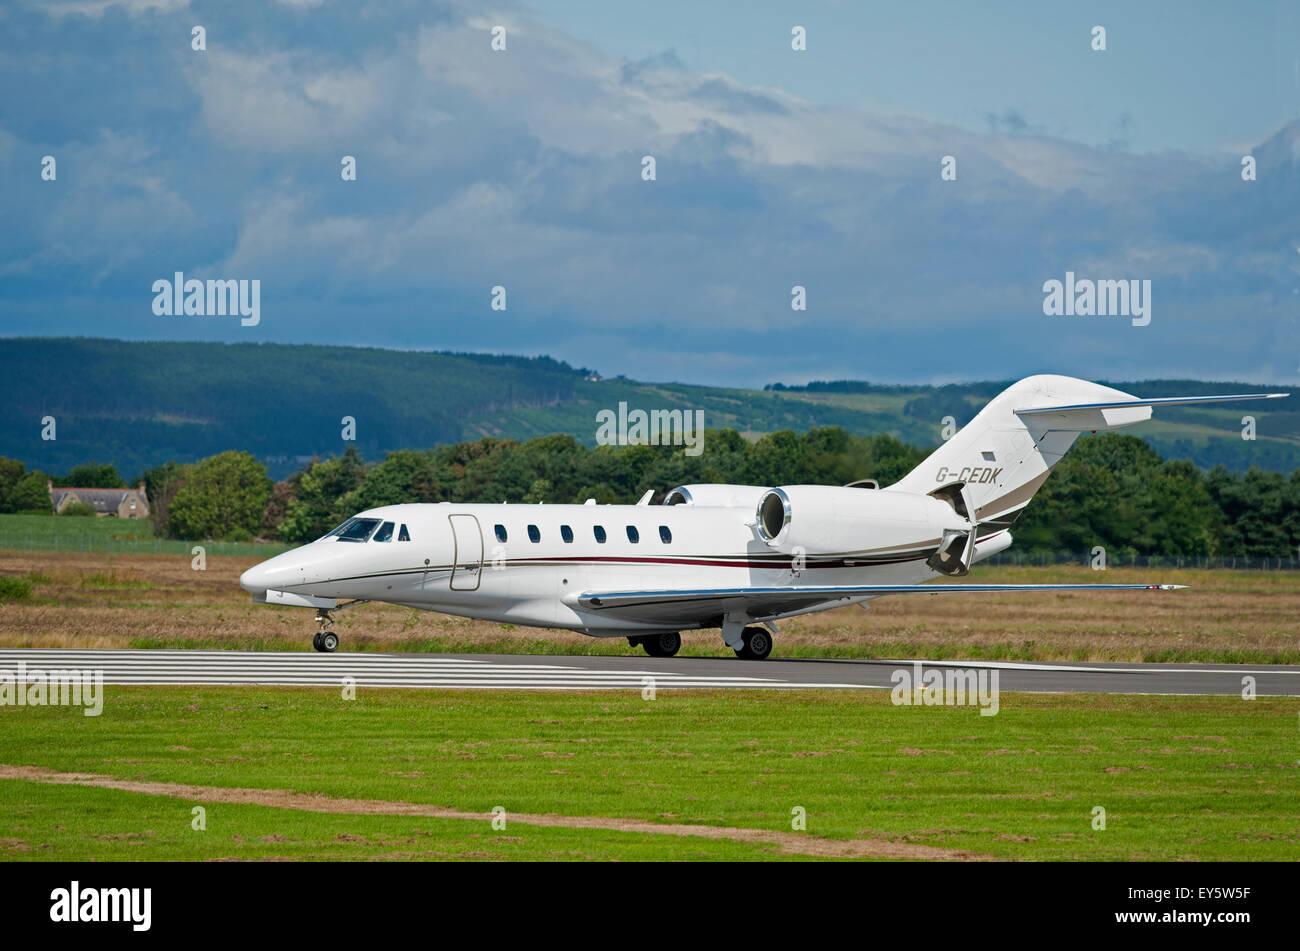 Cessna 750 Citation X Corporate Business Jet Aircraft   SCO 9984. - Stock Image